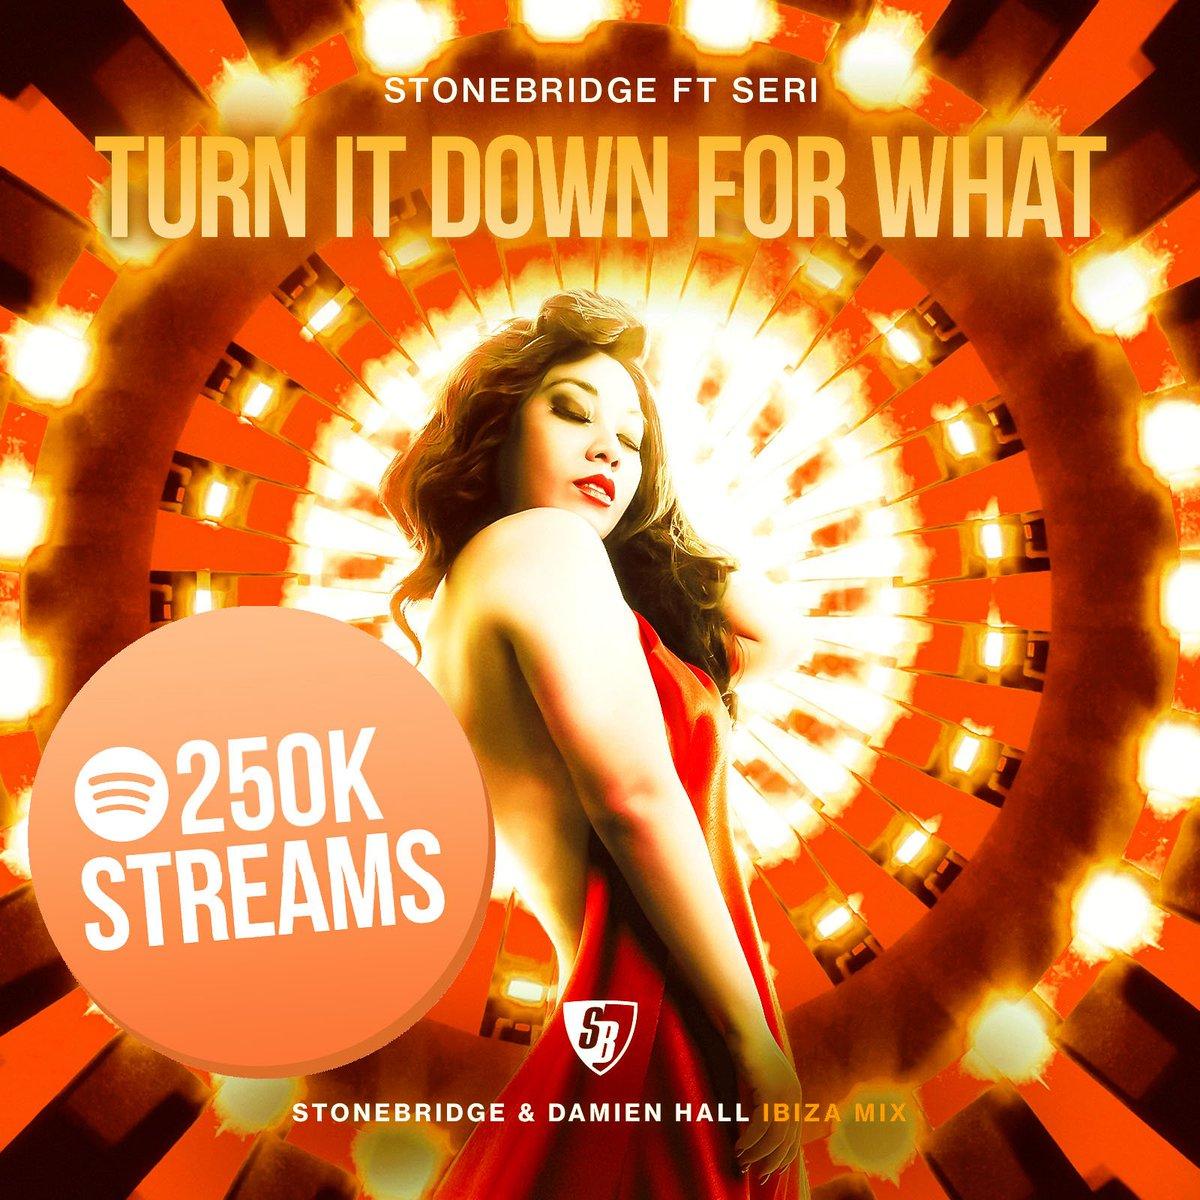 Thanks for the love on StoneBridge ft Seri - Turn It Down For What (StoneBridge &amp; Damien Hall Ibiza Radio) - 250000 streams on @Spotify !  http:// open.spotify.com/track/3Ic0l5kQ s02n6dJLgpnlqN &nbsp; …  #stonebridge #seri #TIDFW #damienhall #stoneyboymusic #ibiza #house<br>http://pic.twitter.com/FdXwgF562v